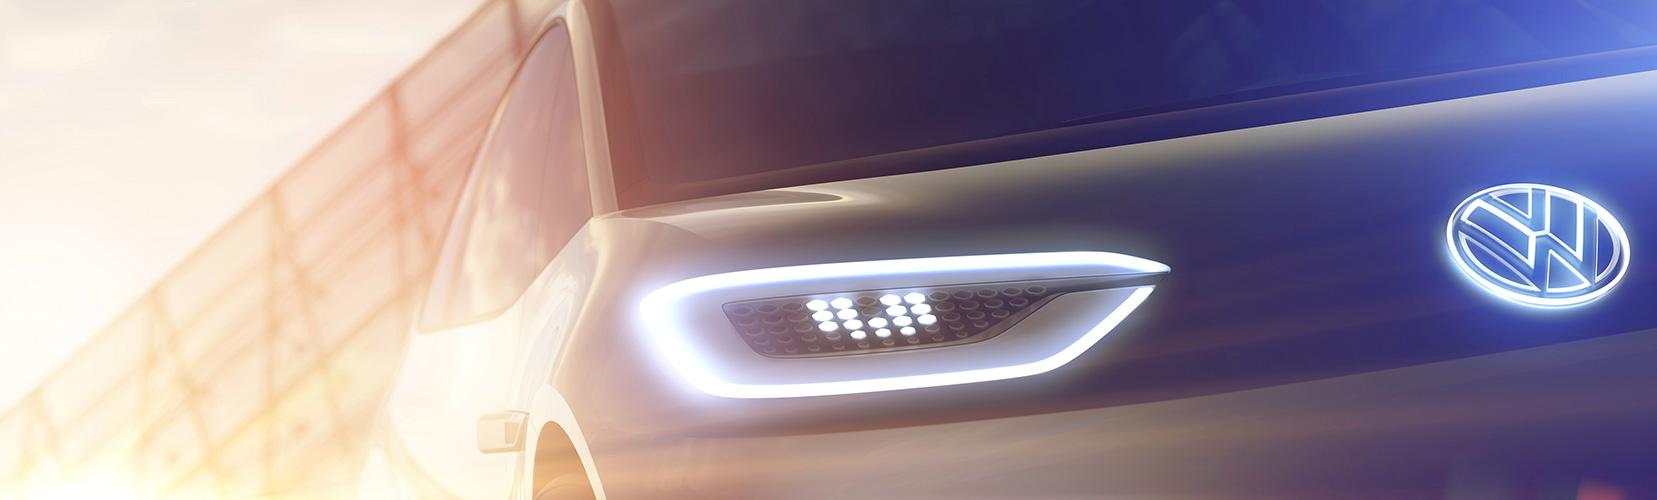 EV晚知道 | 2020款小鹏G3正式上市